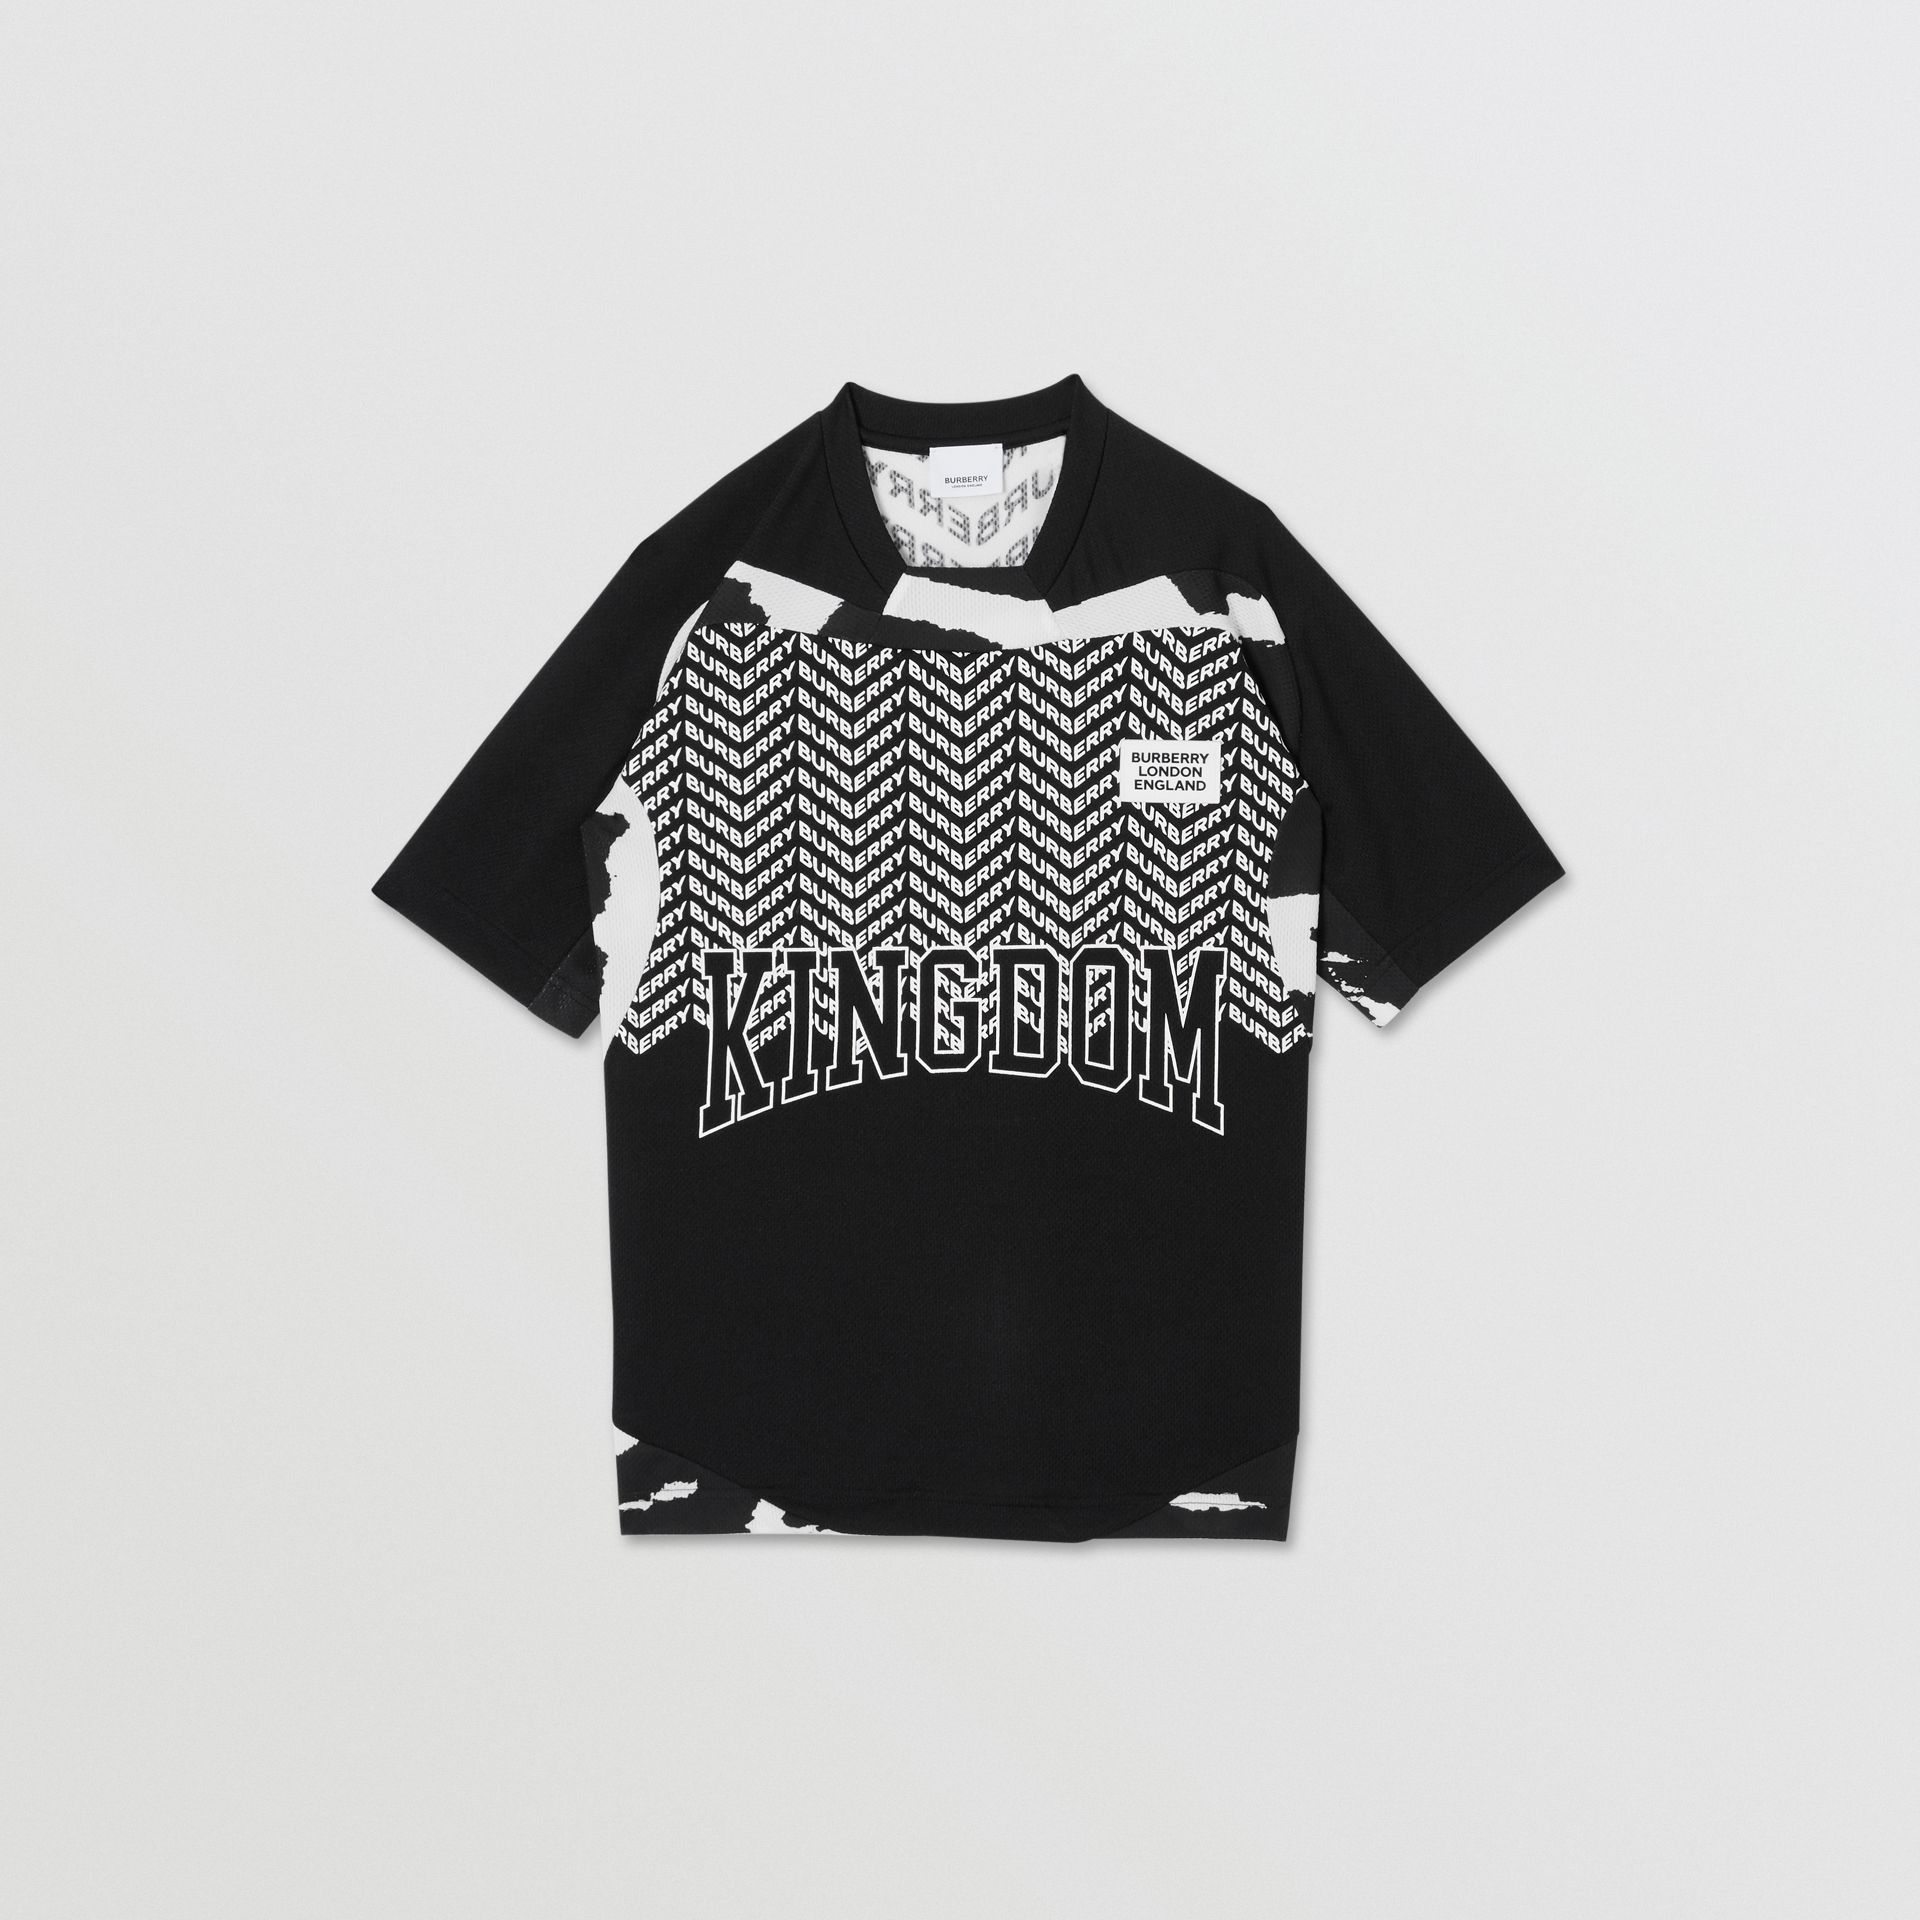 Kingdom 印花網眼 T 恤 (黑色) | Burberry - 圖庫照片 0